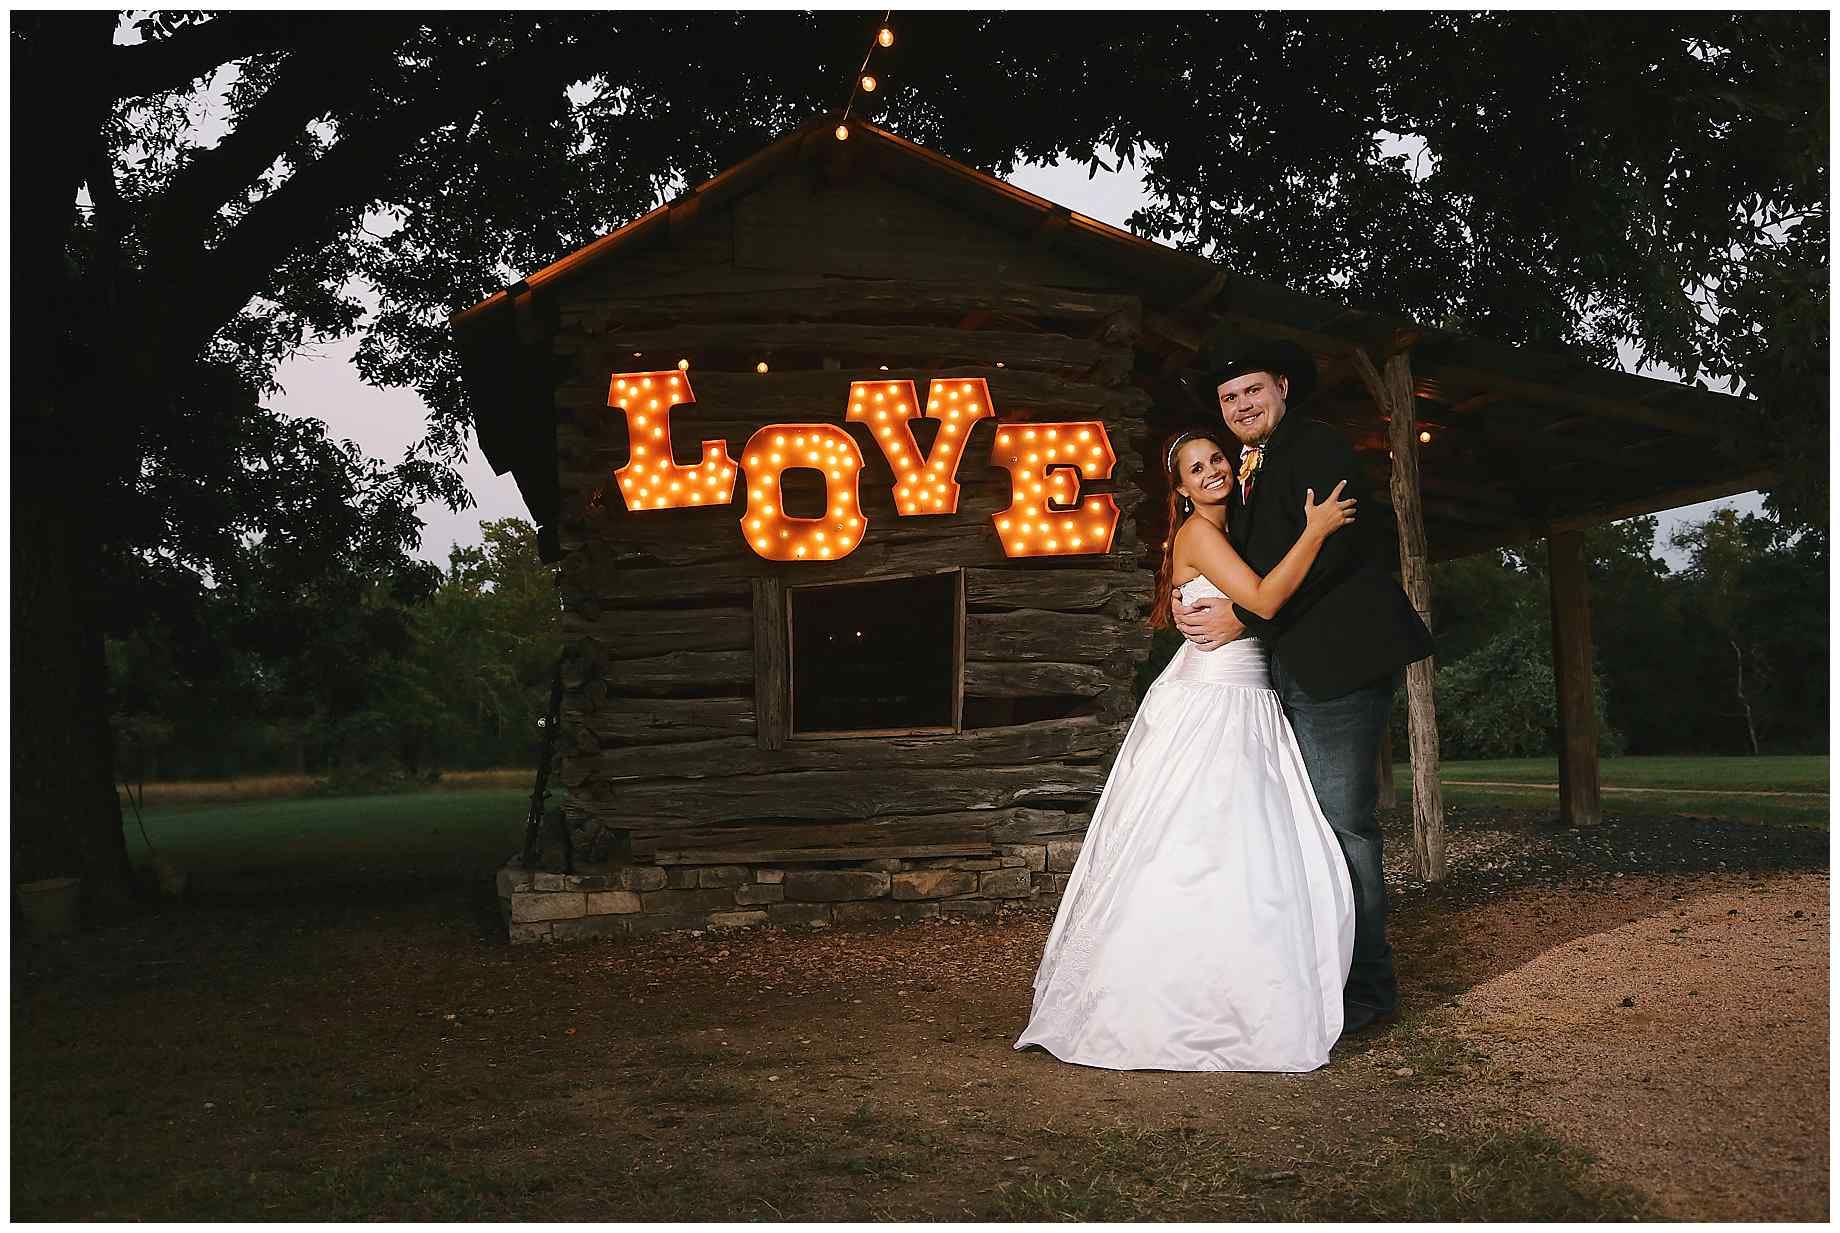 pecan-springs-ranch-austin-tx-wedding-023